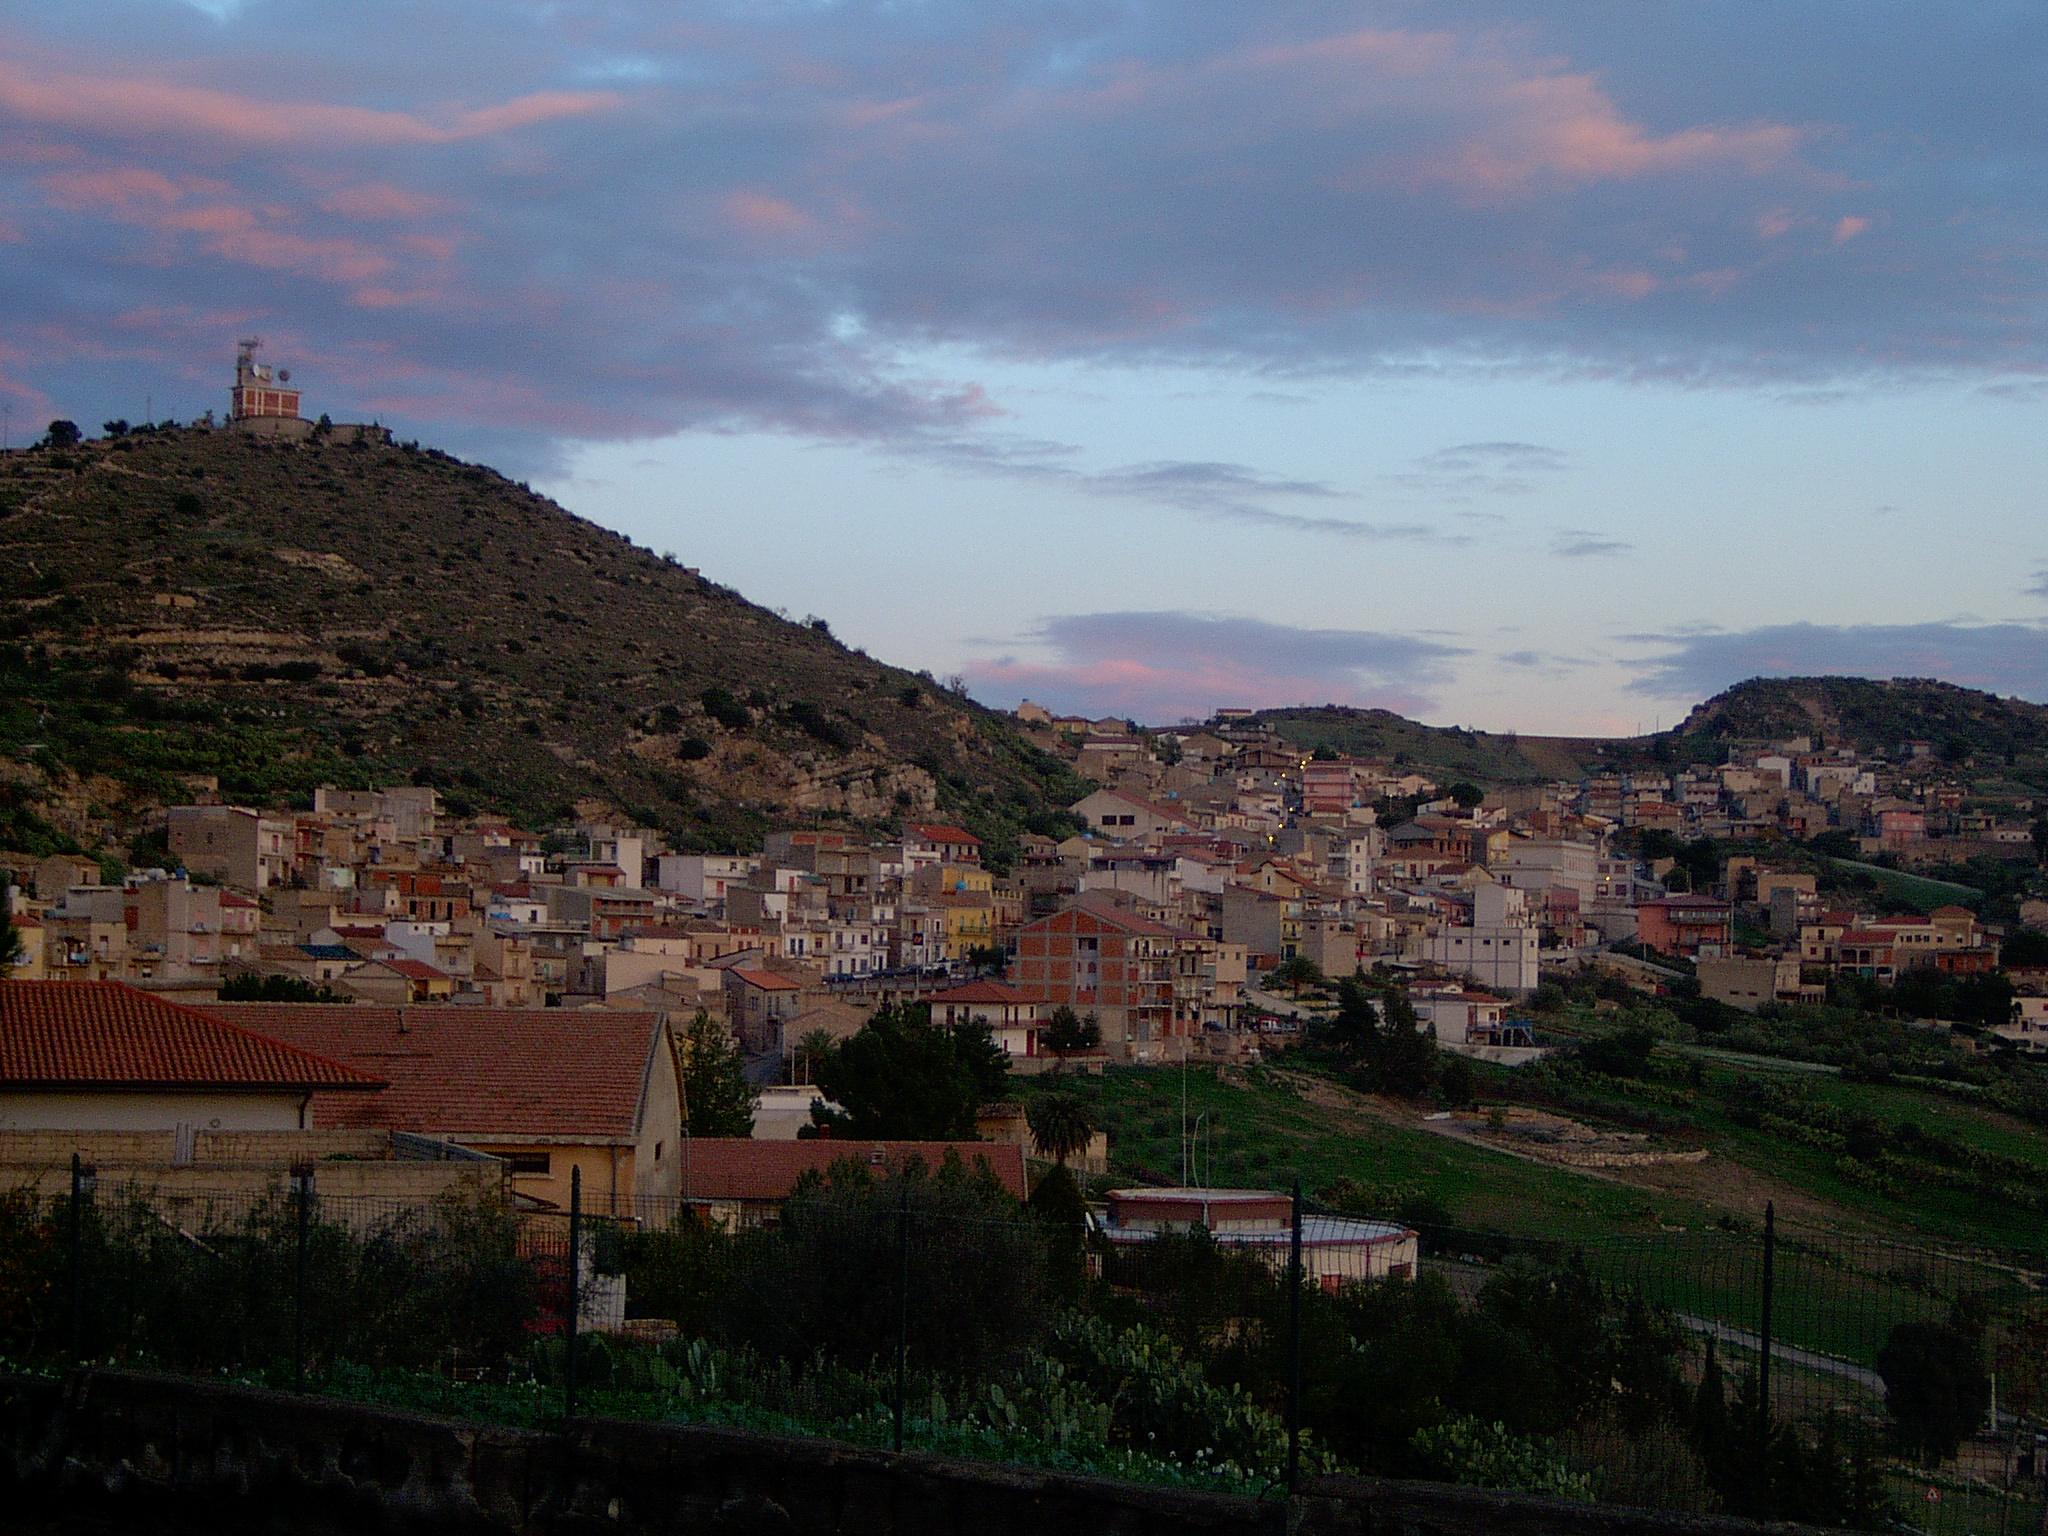 Castel di Judica - Sicily